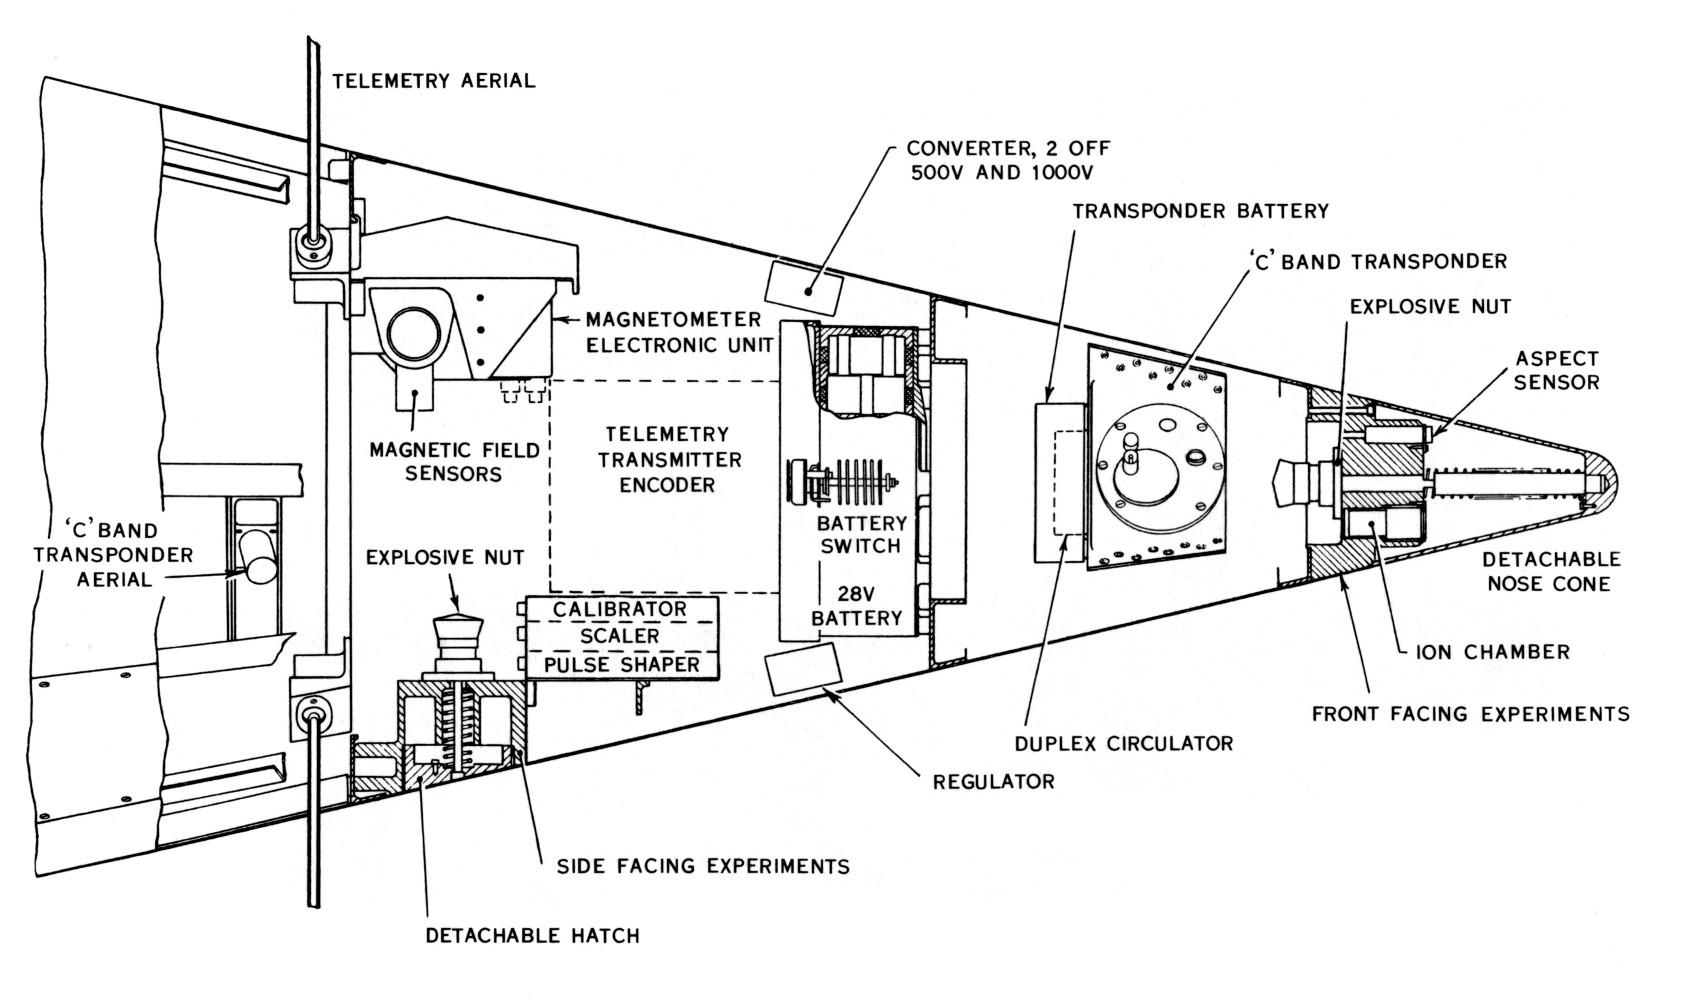 australia u2019s first satellite  u0026 the last redstone